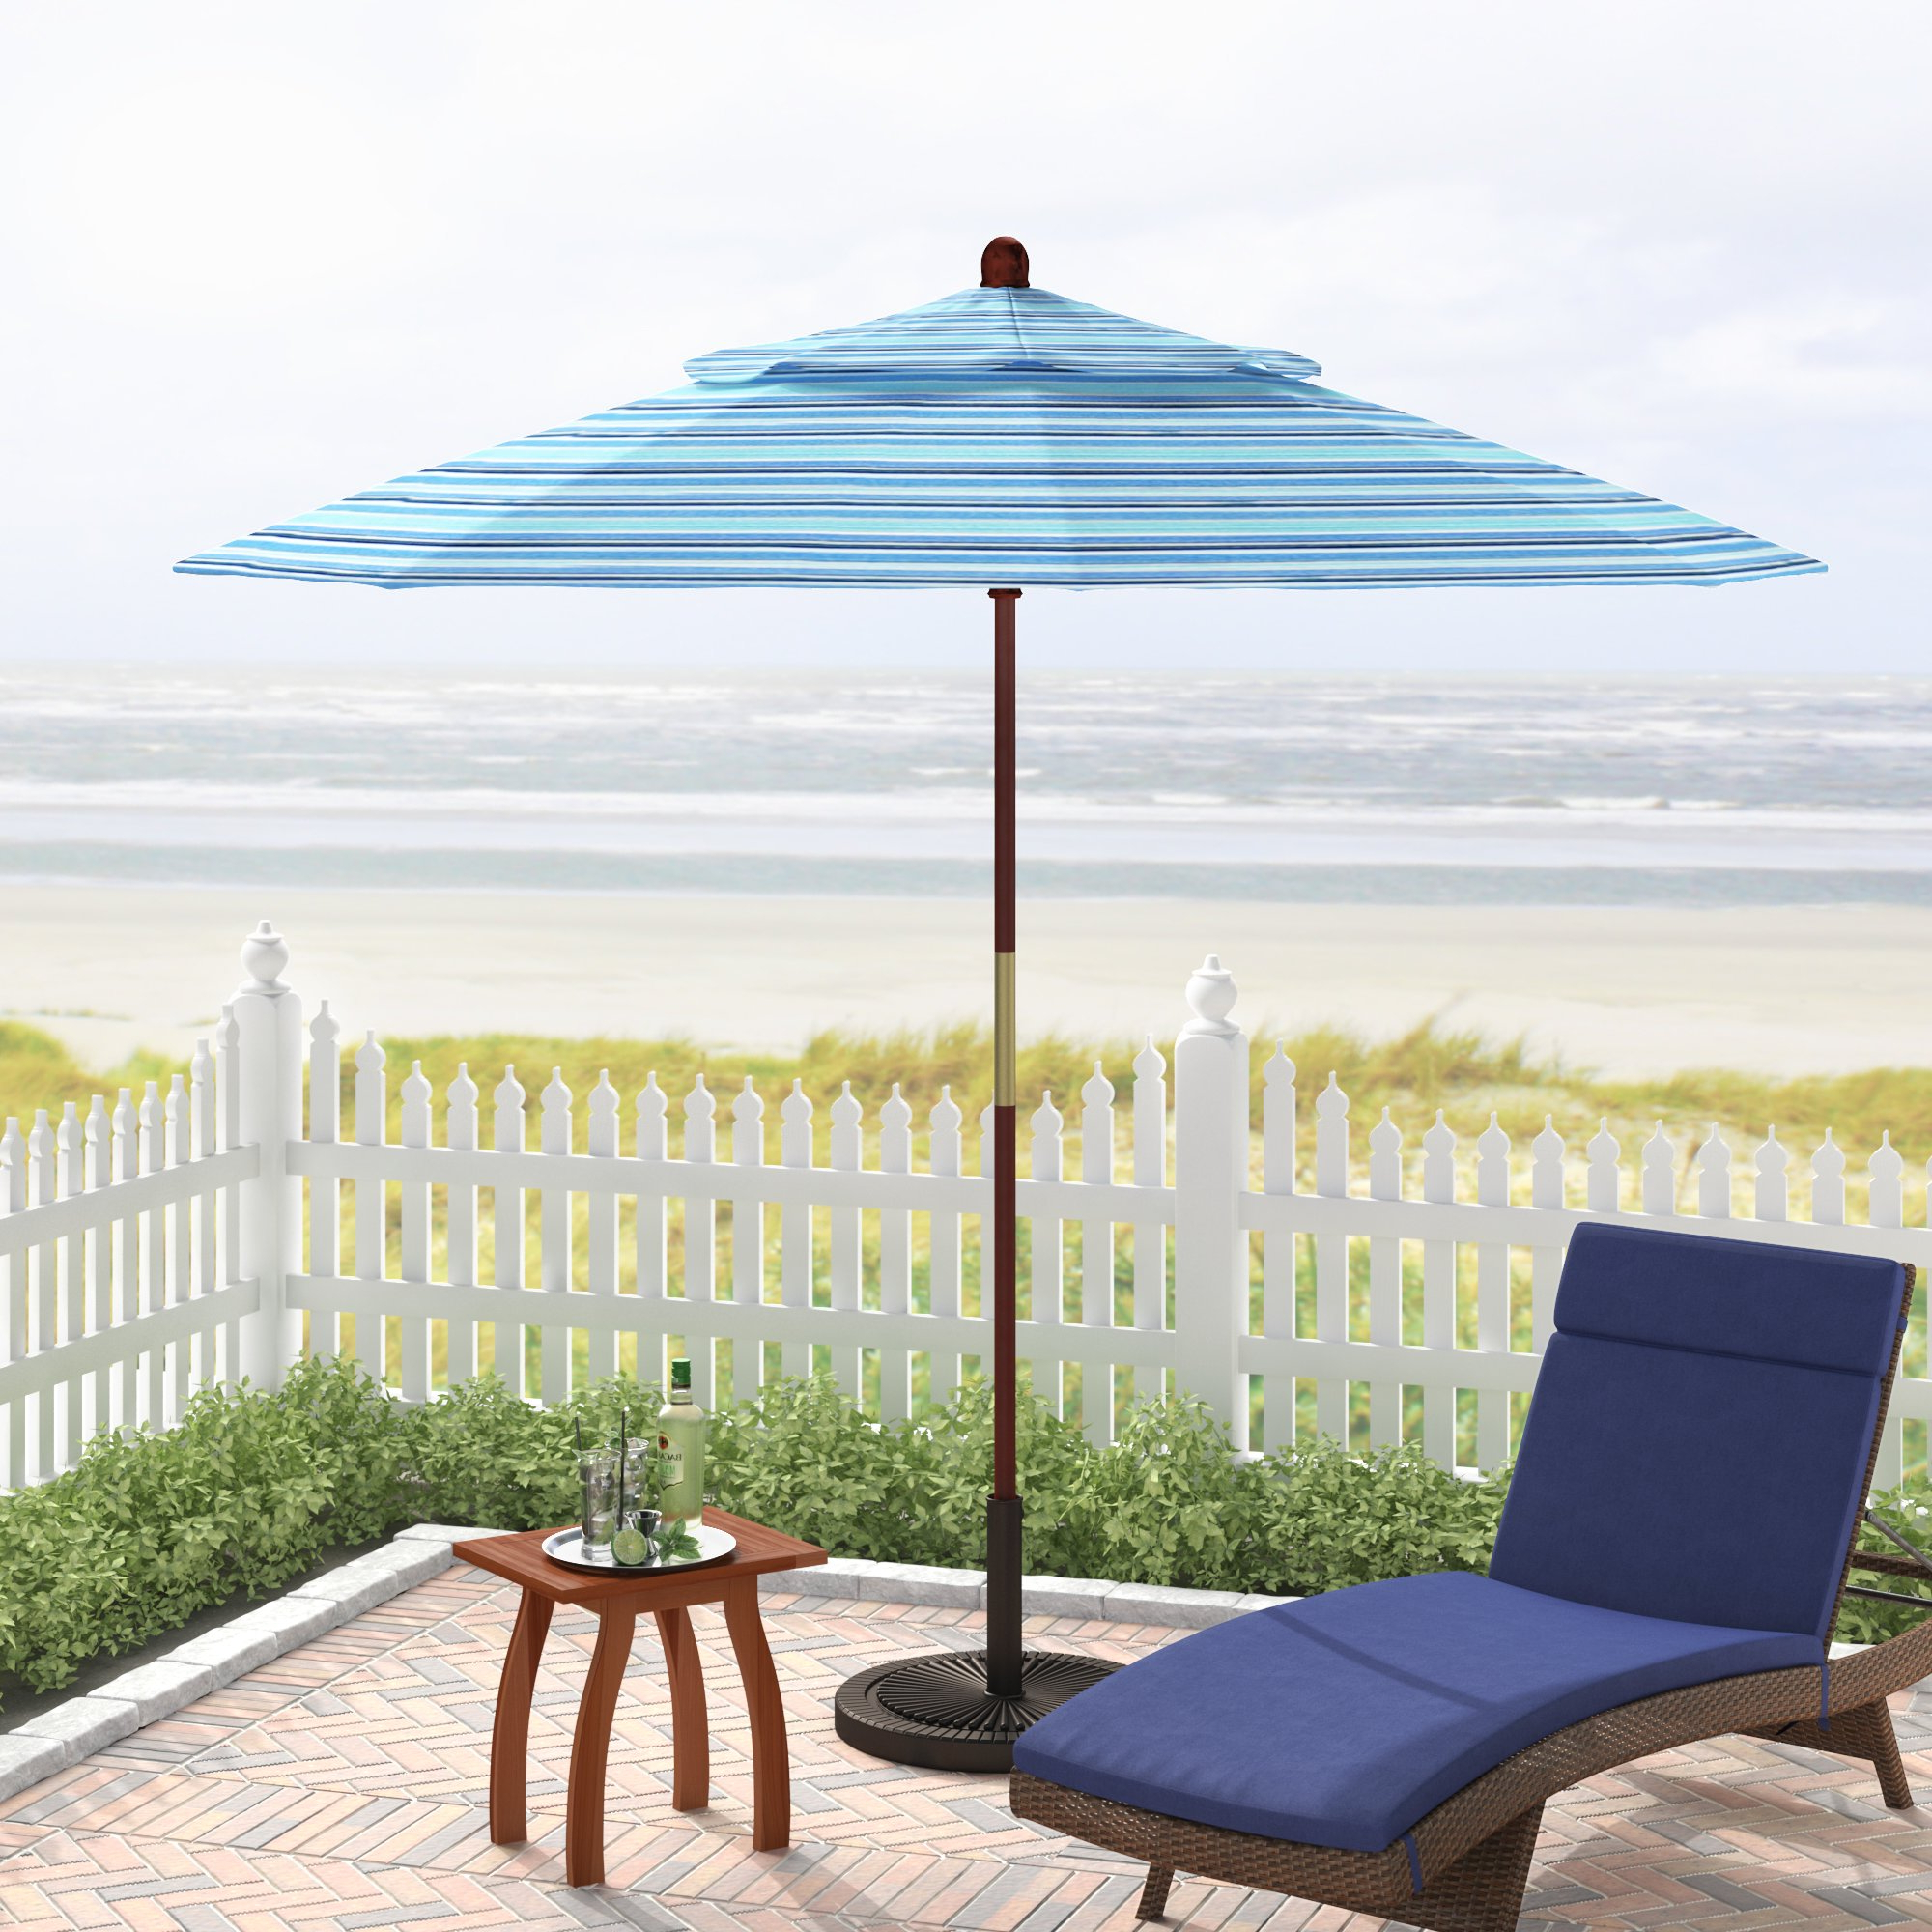 Mraz 9' Market Sunbrella Umbrella Intended For Most Recent Caravelle Market Sunbrella Umbrellas (View 17 of 20)